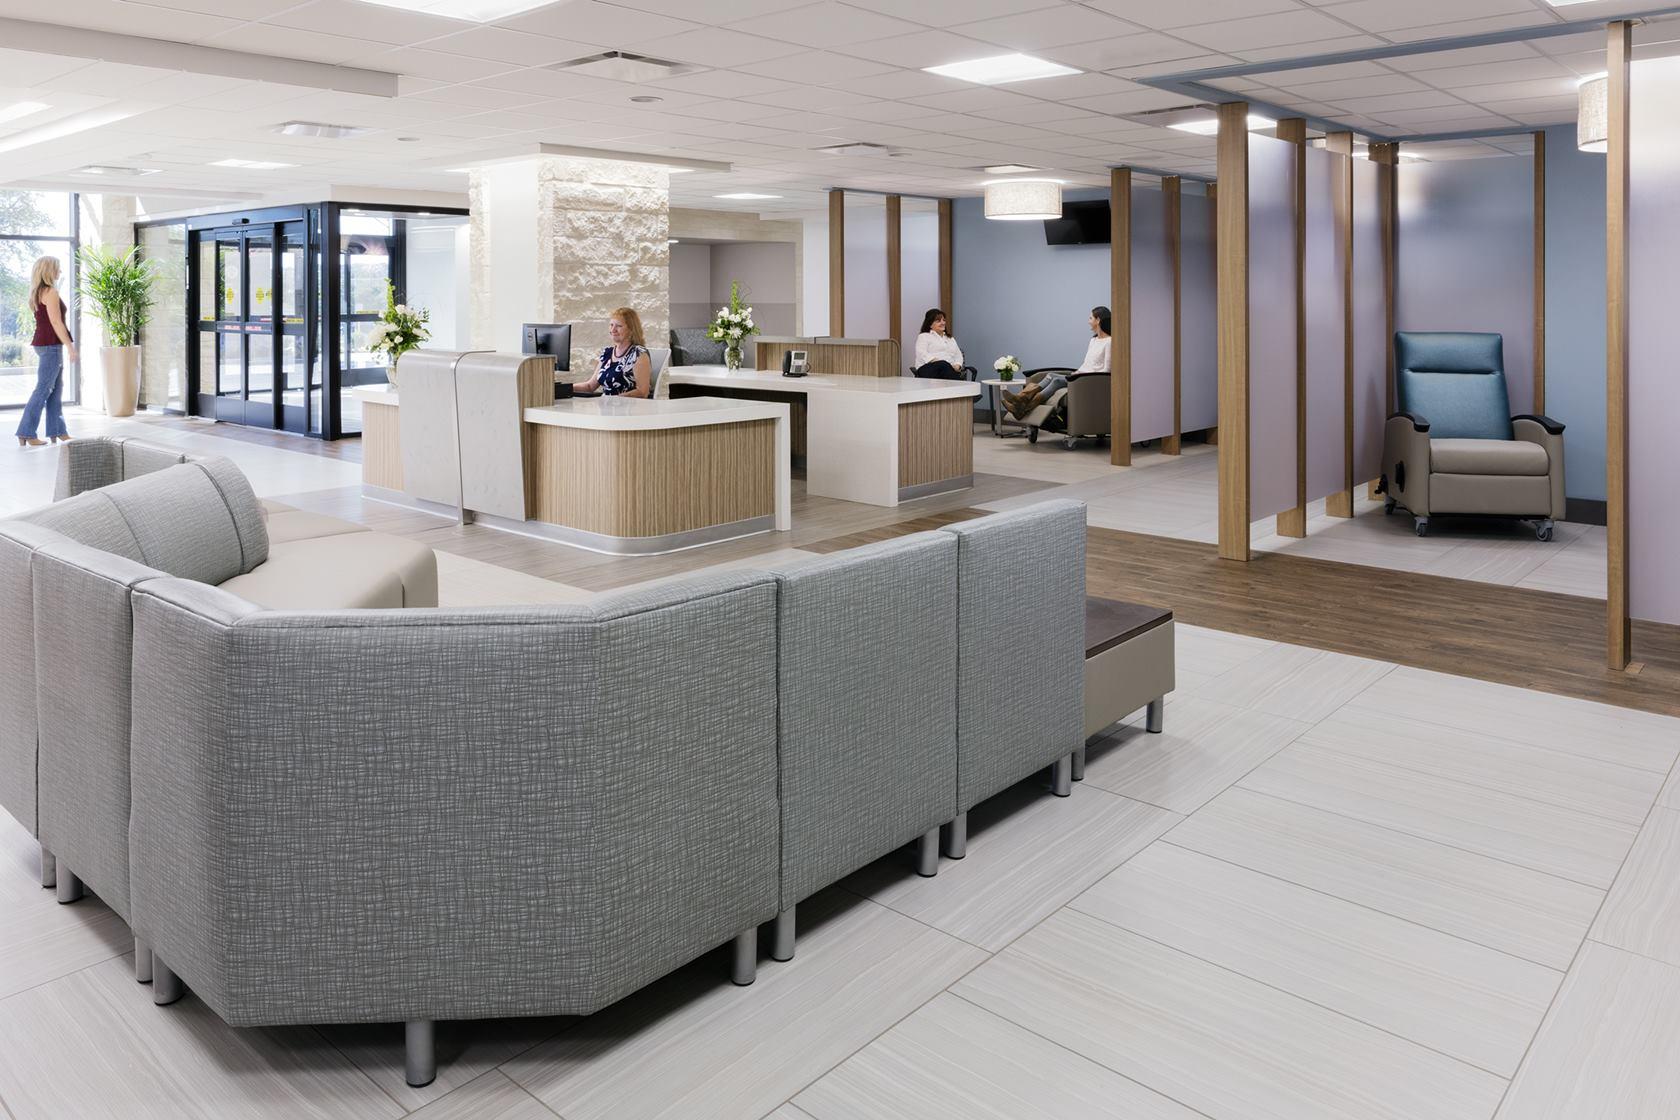 North Central Baptist Orthopedic Hospital ground floor lobby